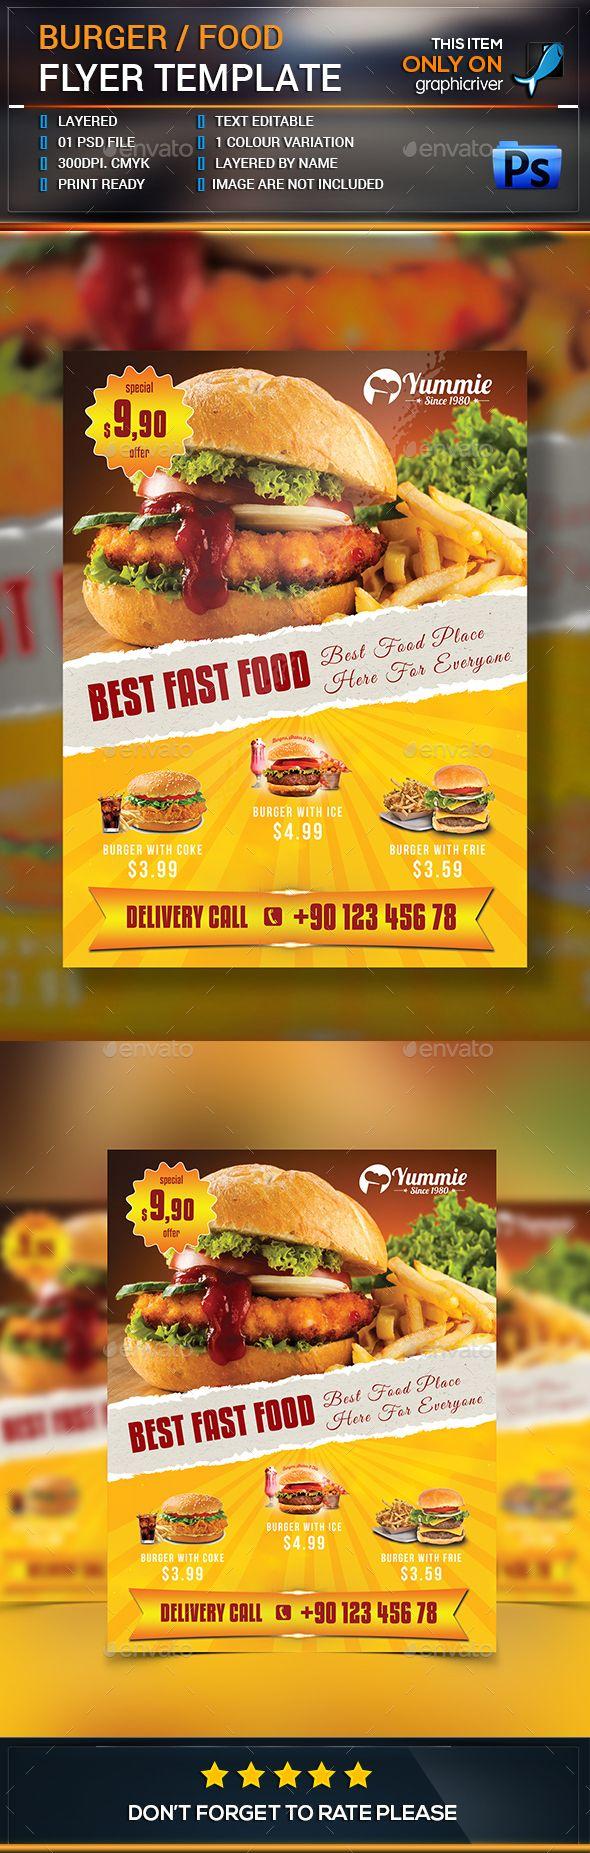 Burger/Food Flyer - Restaurant #Flyers Download here: https://graphicriver.net/item/burgerfood-flyer/15373338?ref=classicdesignp